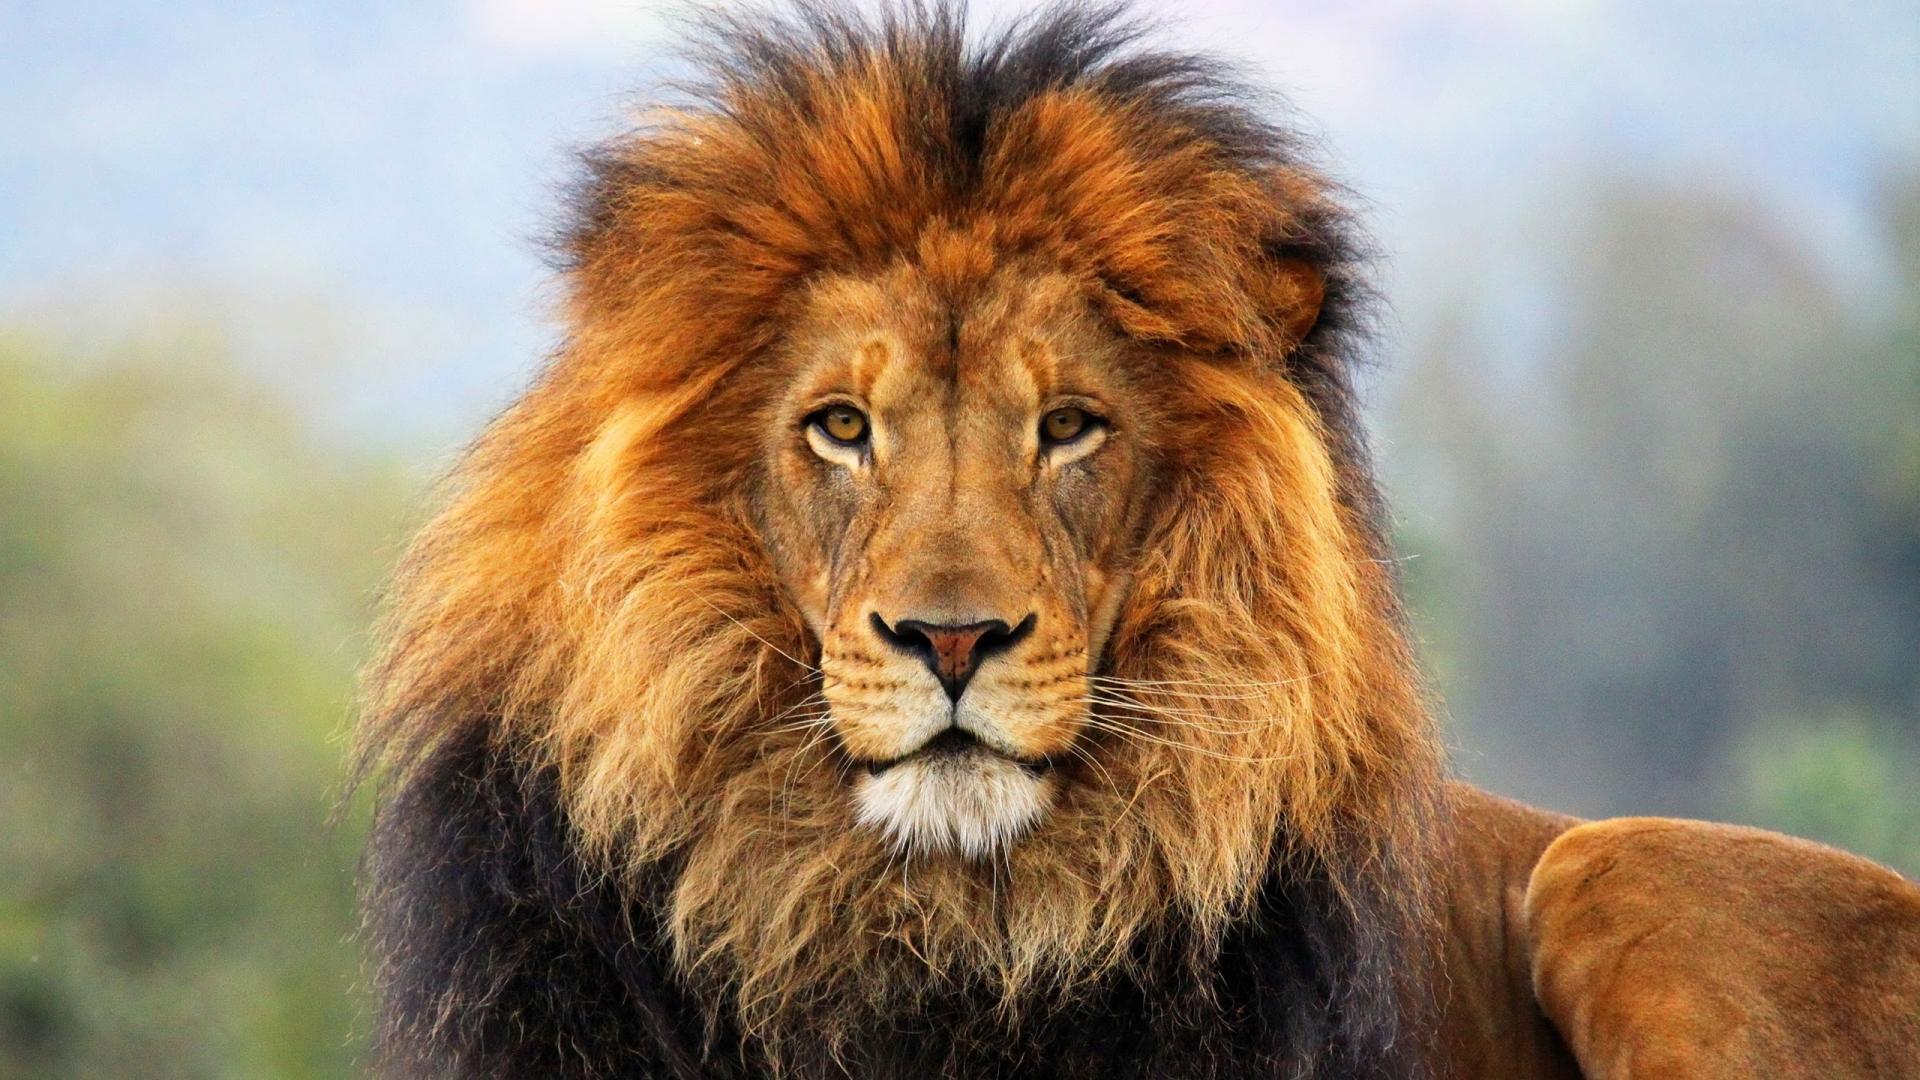 Lion HD Wallpapers - WallpaperSafari